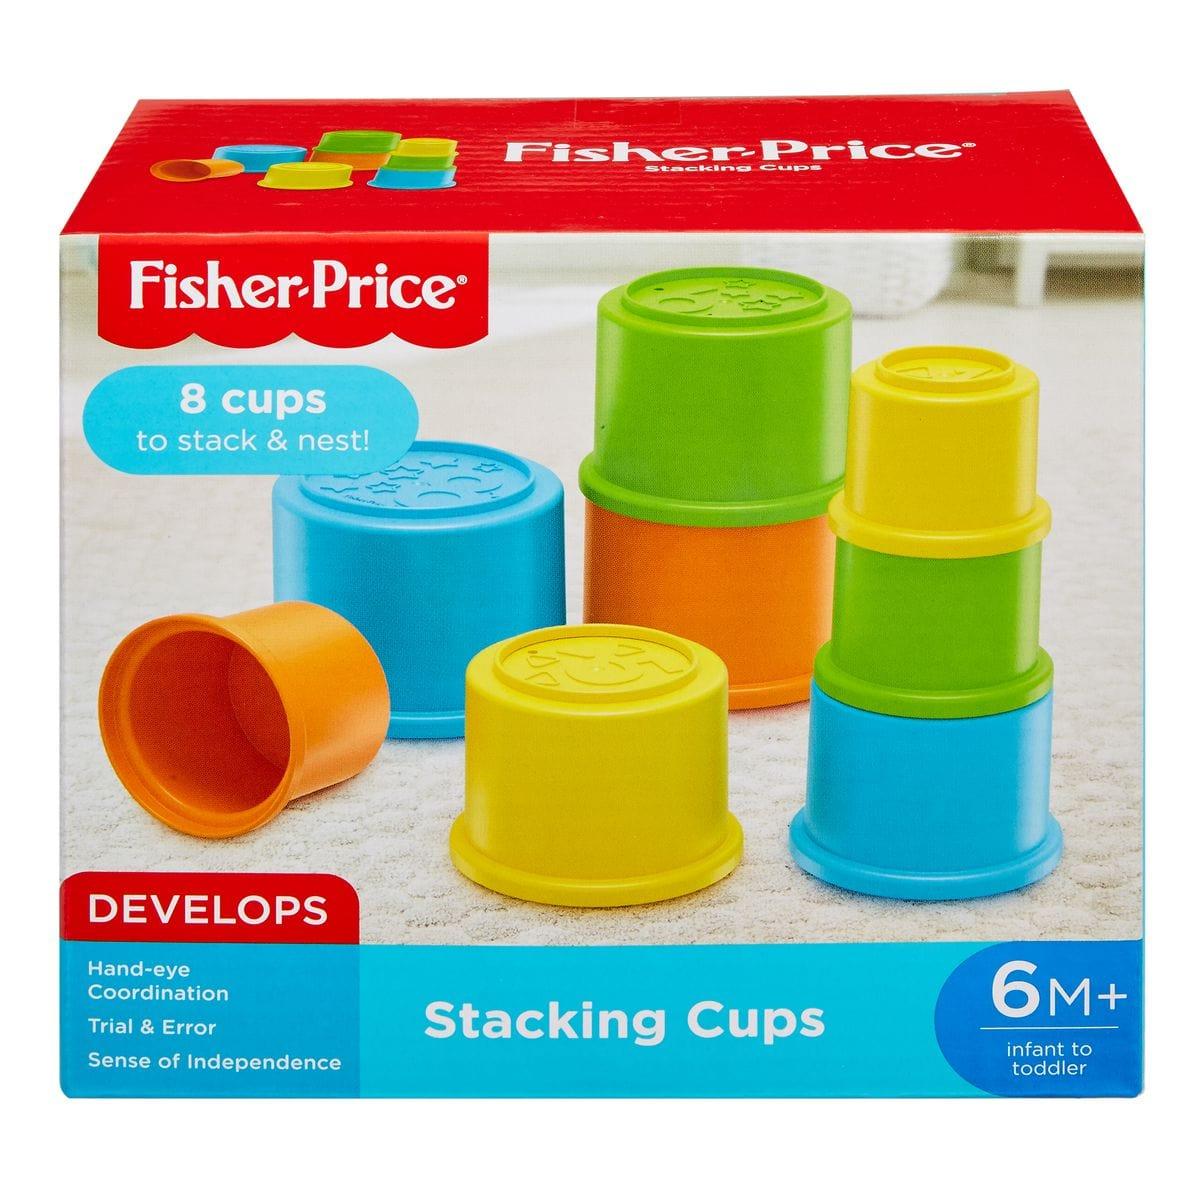 Fisher-Price GCM79 Stacking Cups Giochi educativi